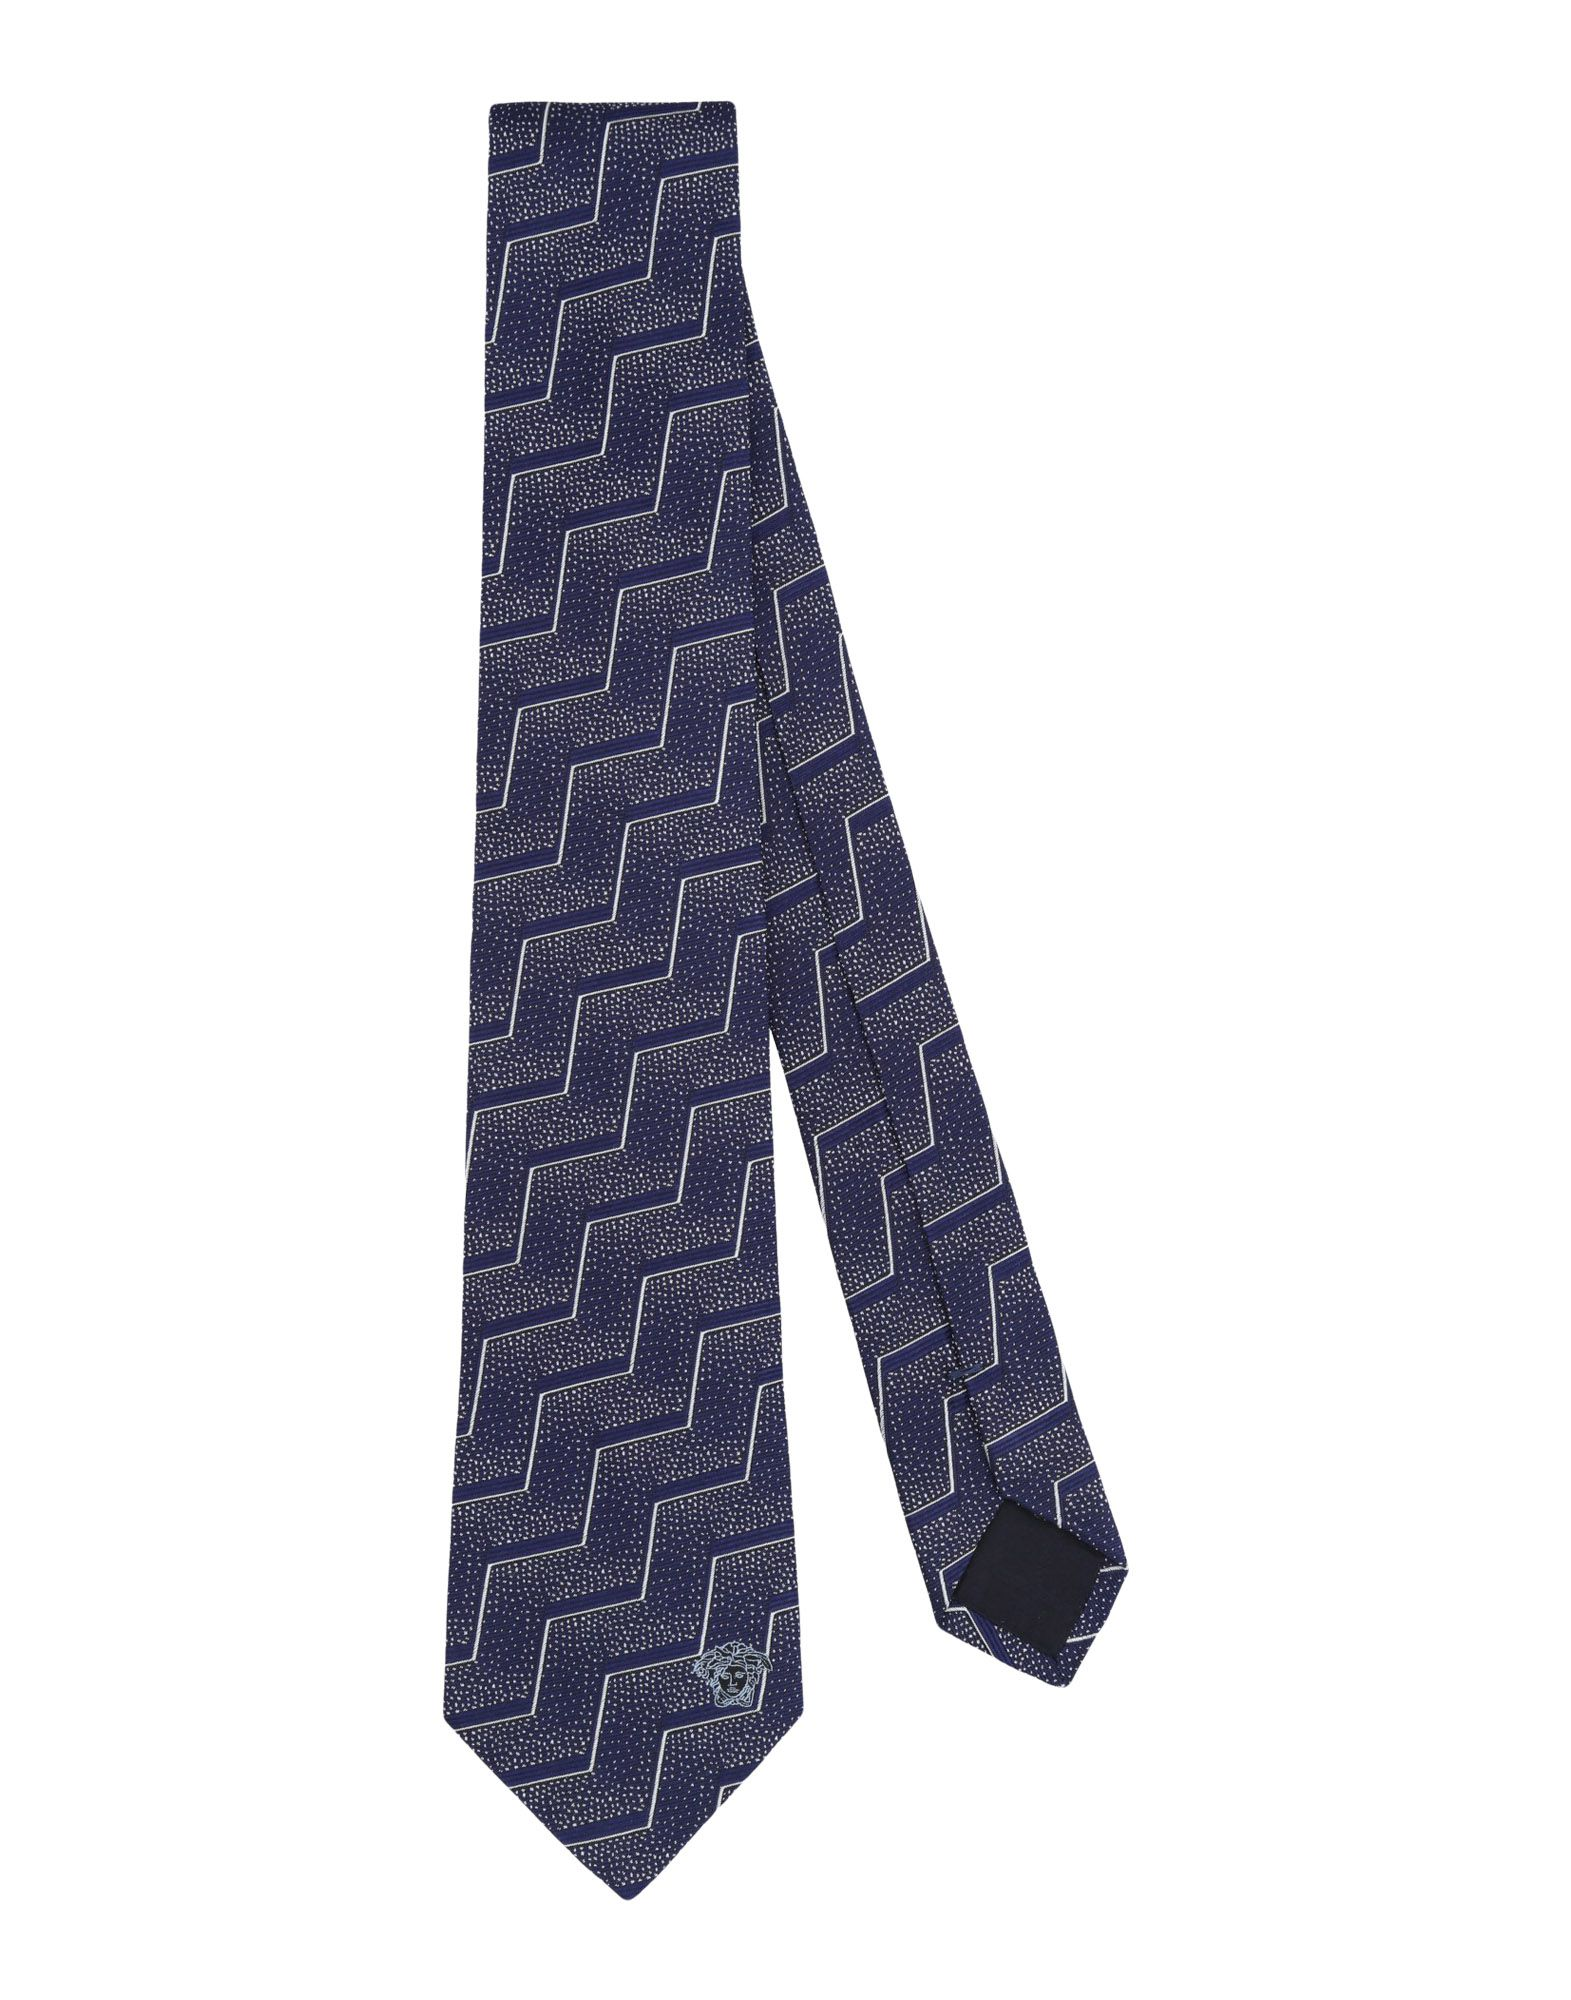 VERSACE Галстук versace бордовый галстук в клетку внизу с логотипом versace 821752 page 1